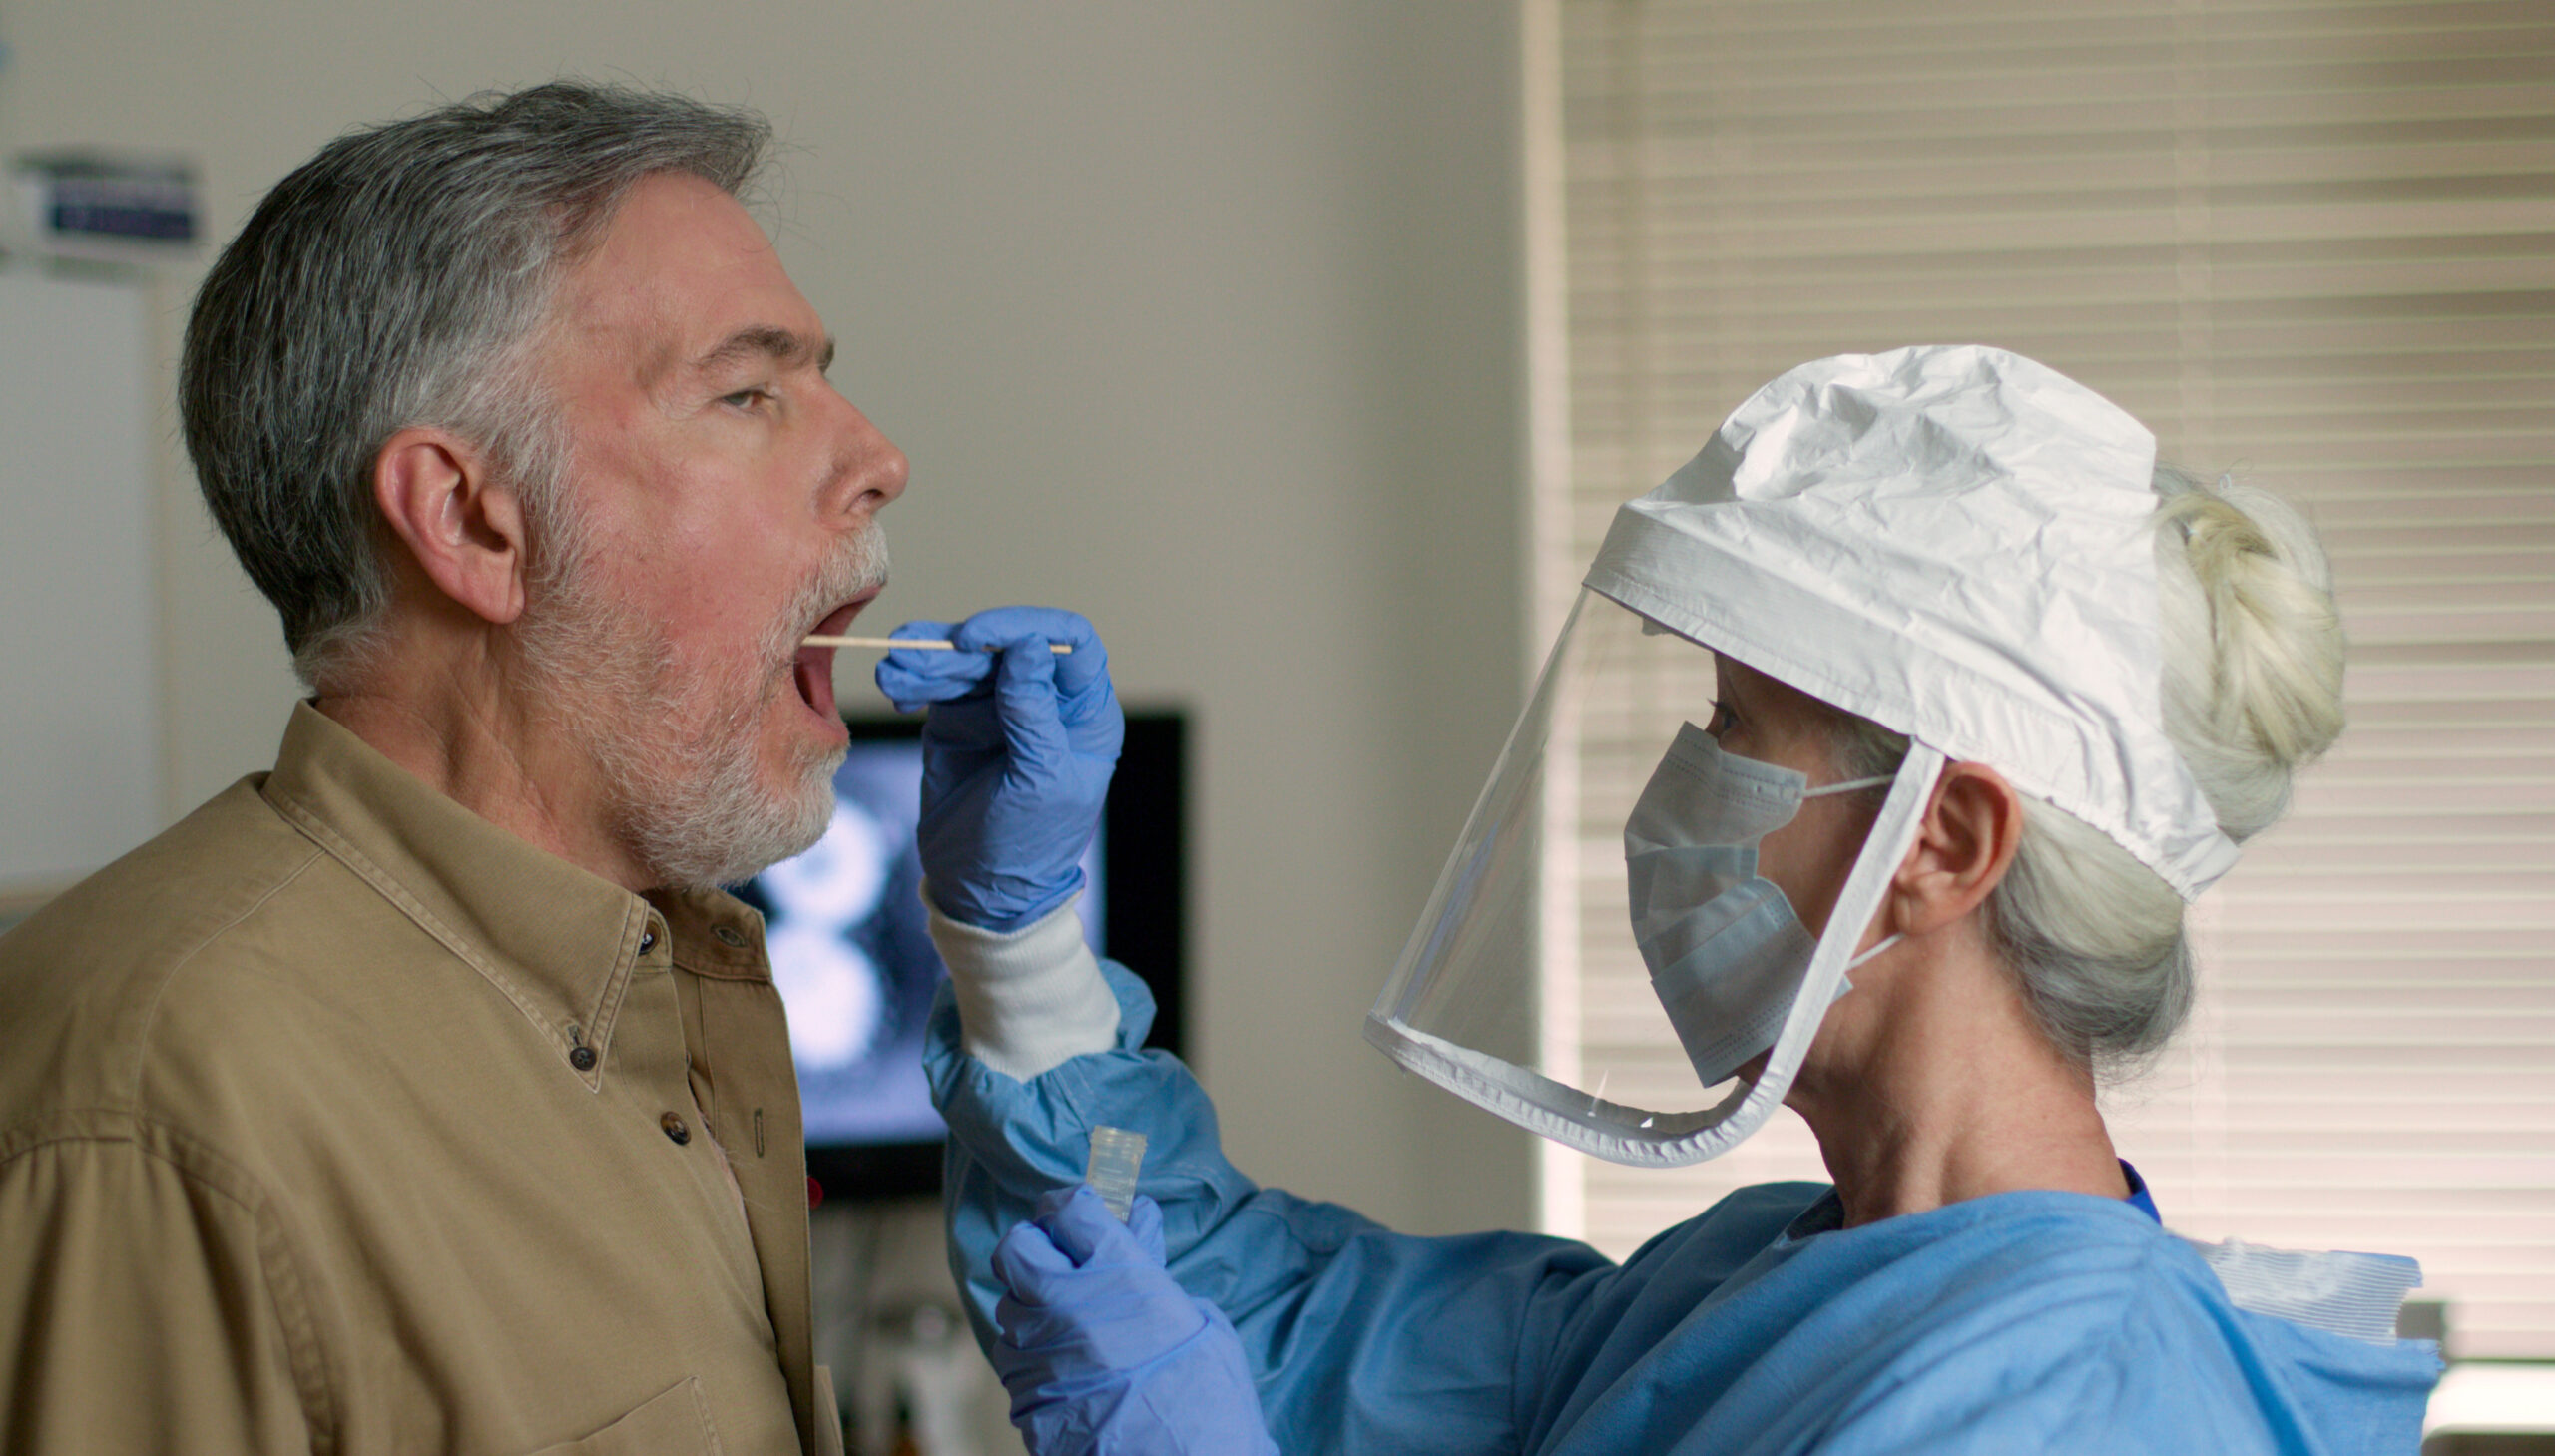 阅读有关文章的更多信息 How Many Coronavirus Test Types Exists?